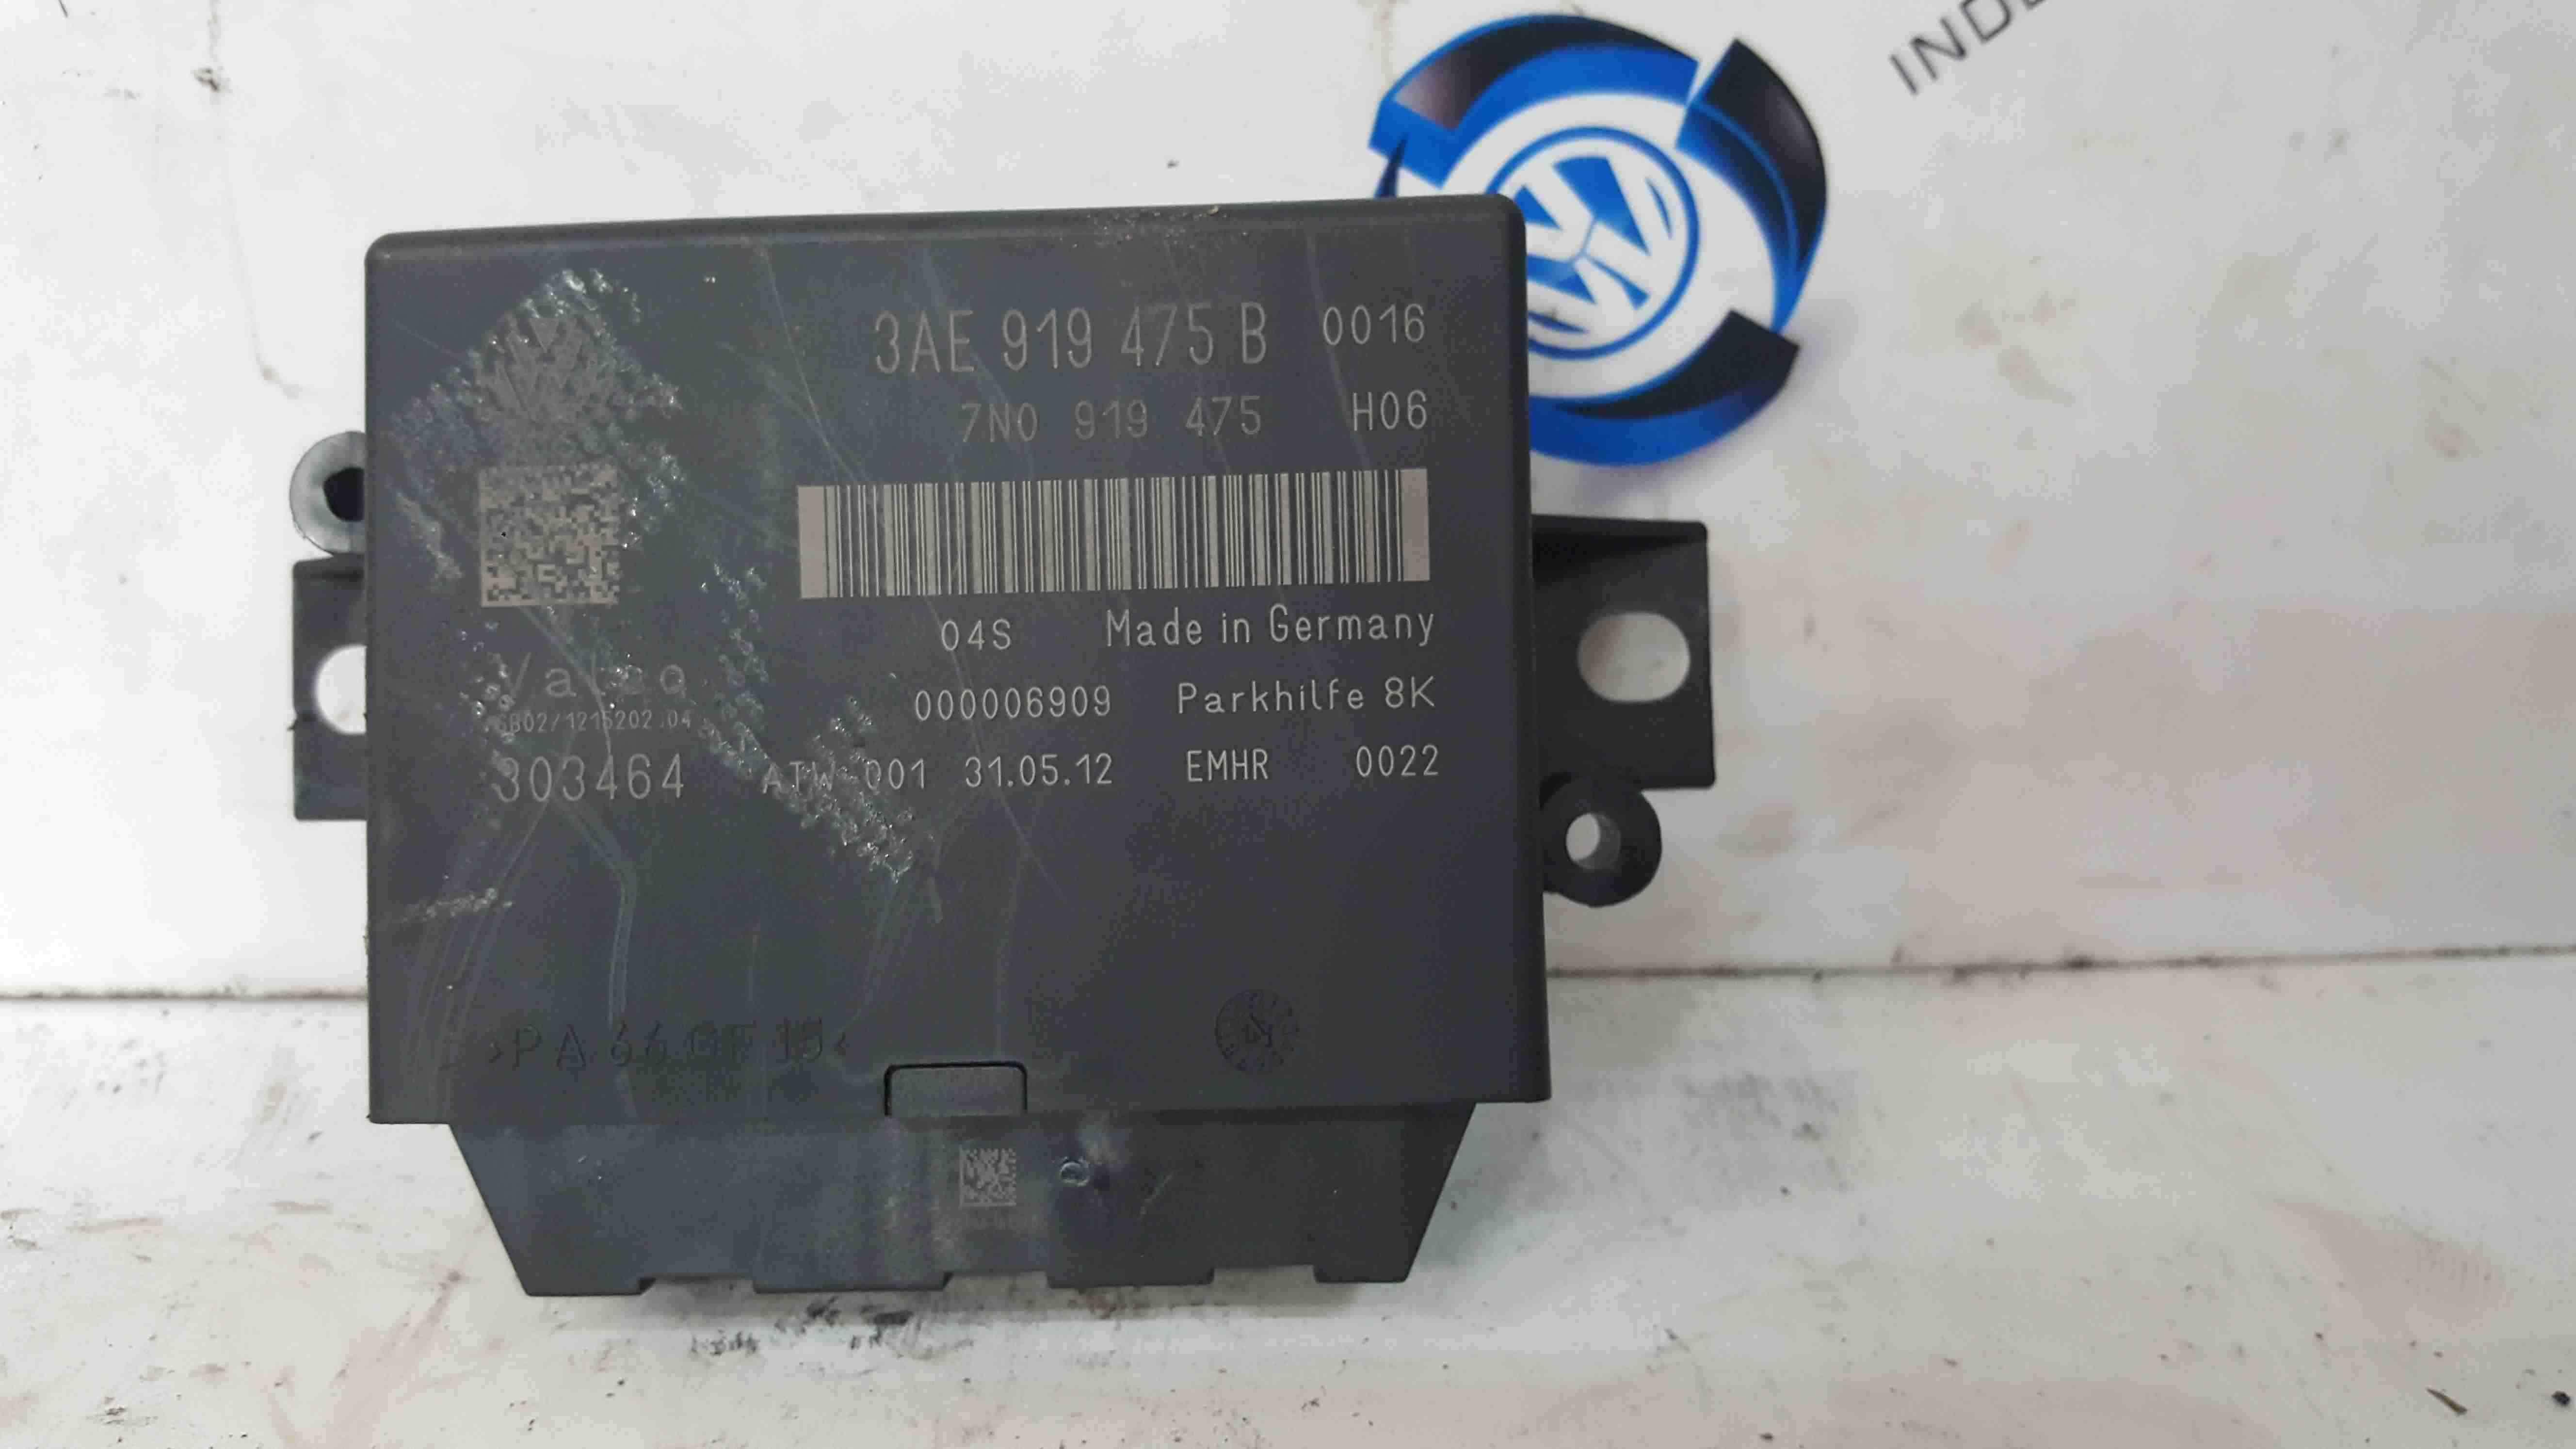 Volkswagen Passat B7 2010-2015 Parking Sensor Module 3AE919475B